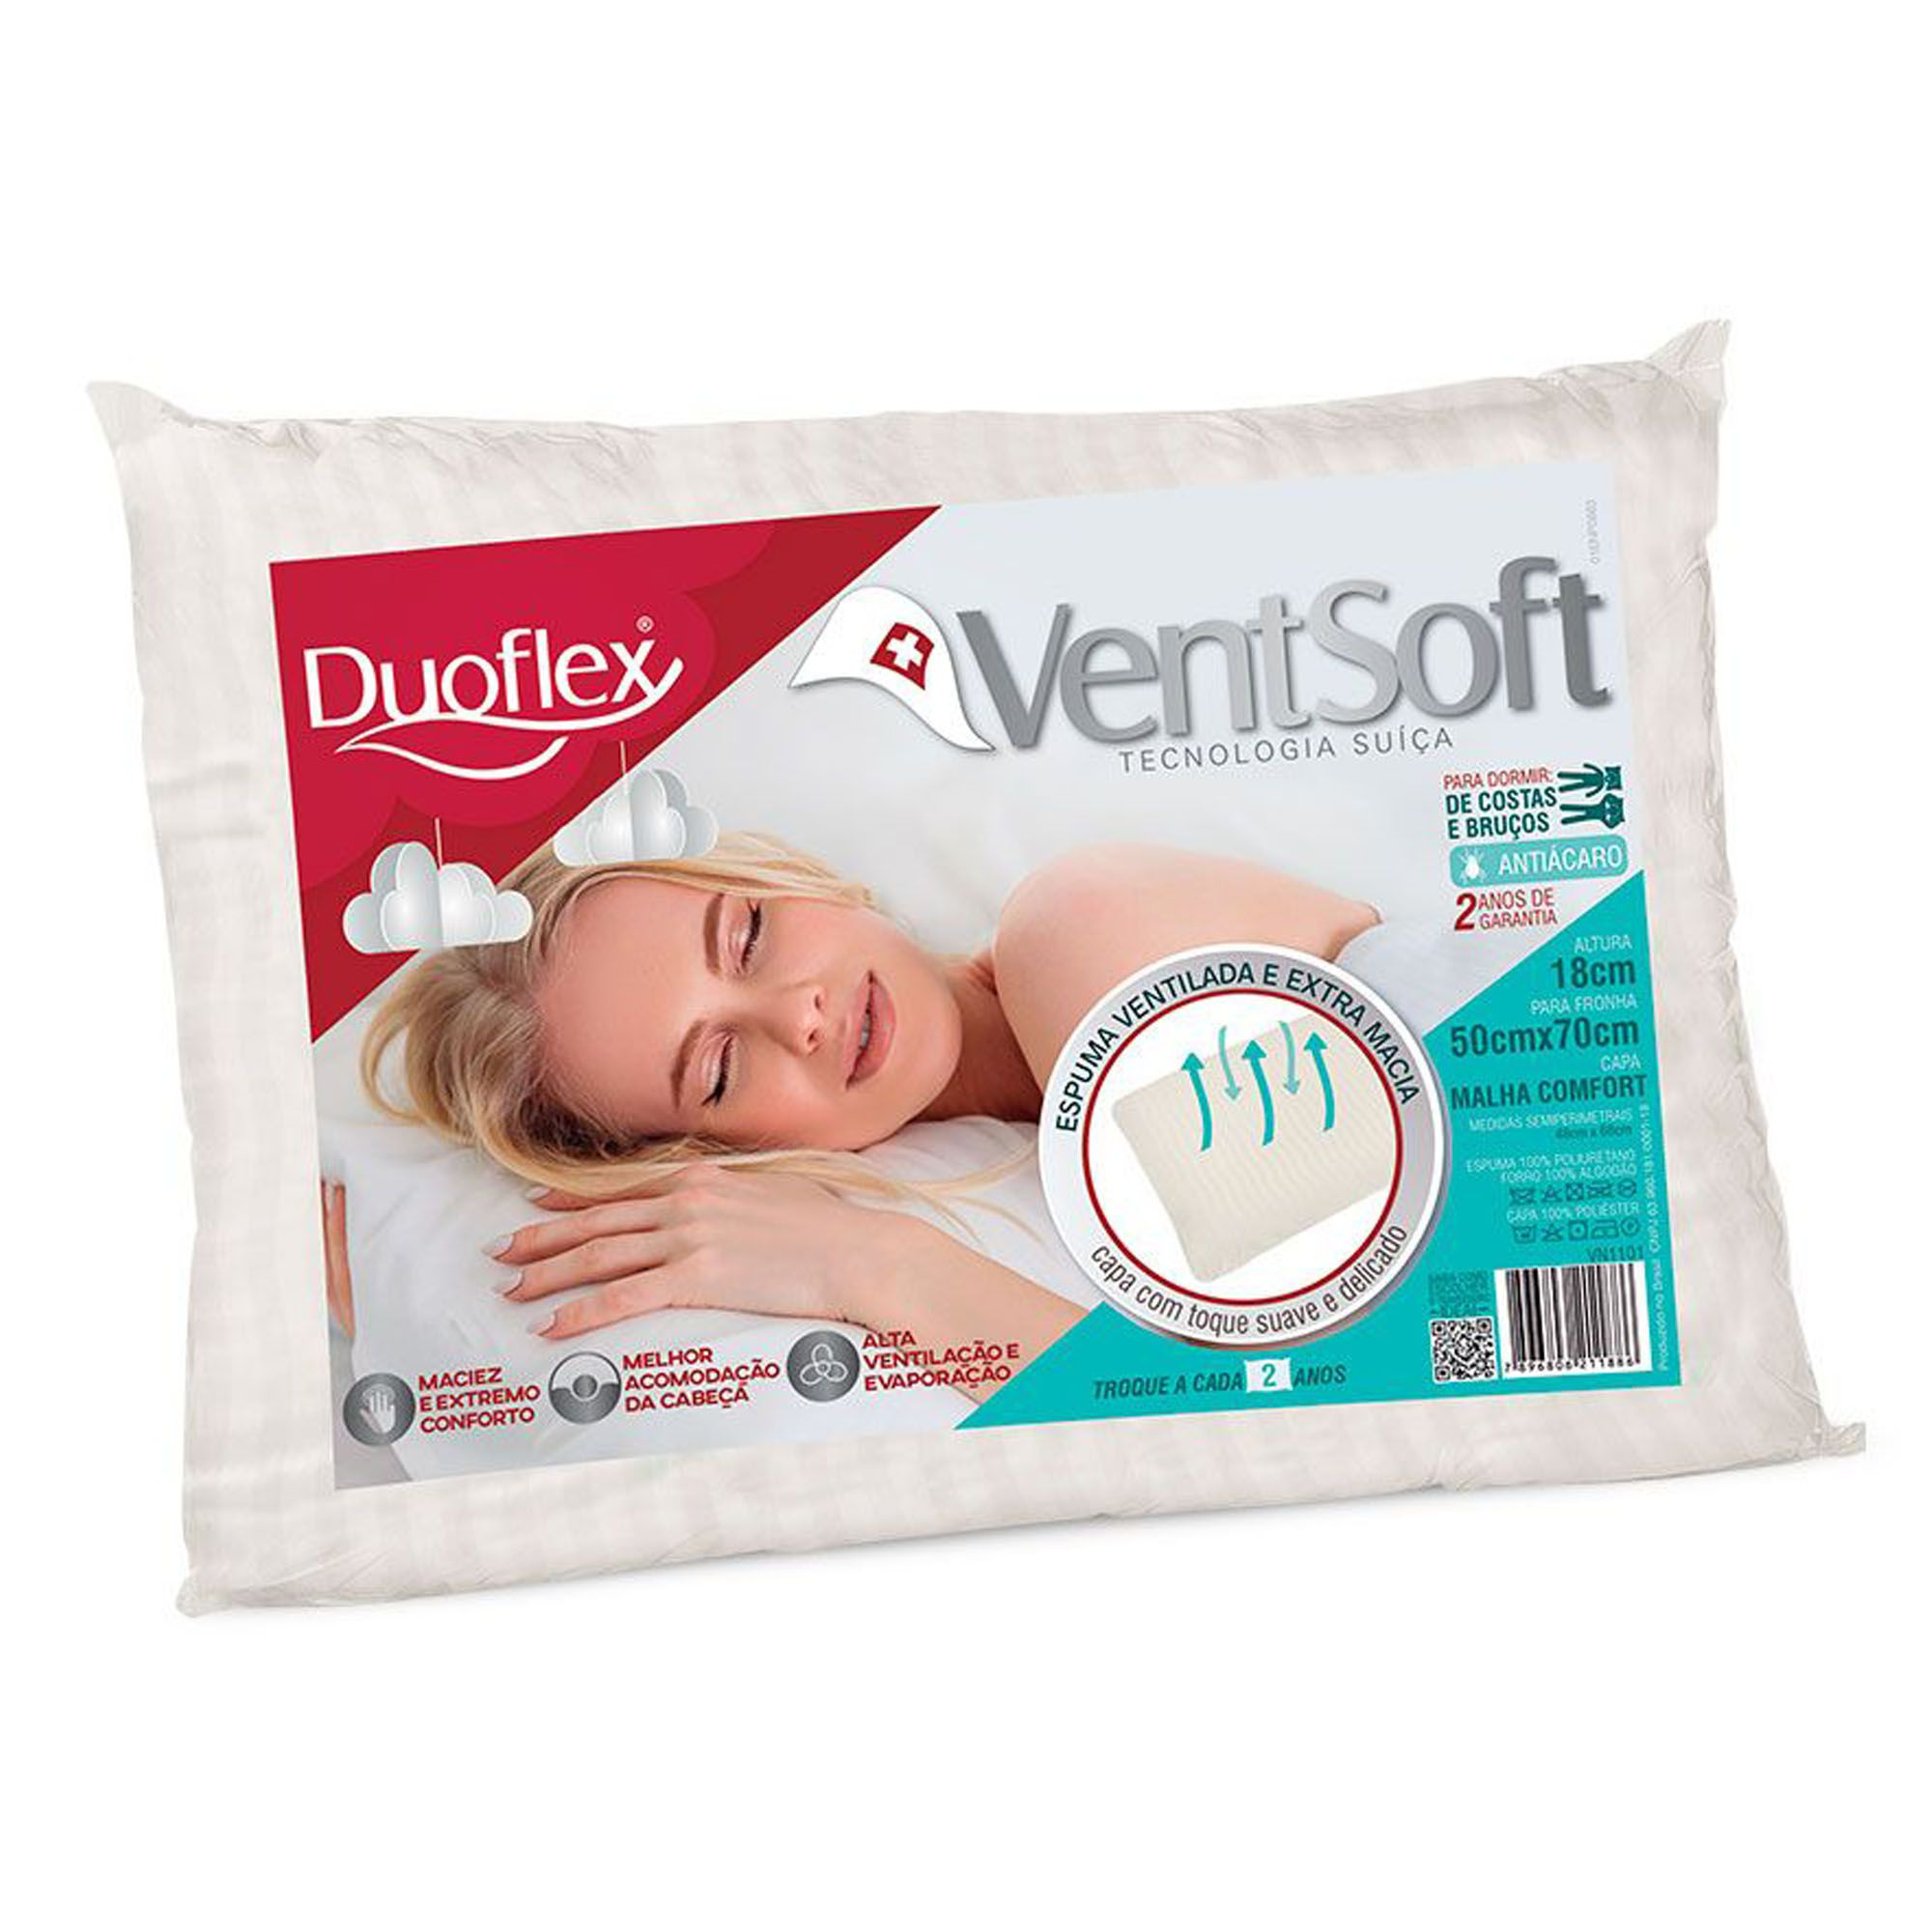 Travesseiro Ventsoft 050 x 070 x 018 cm